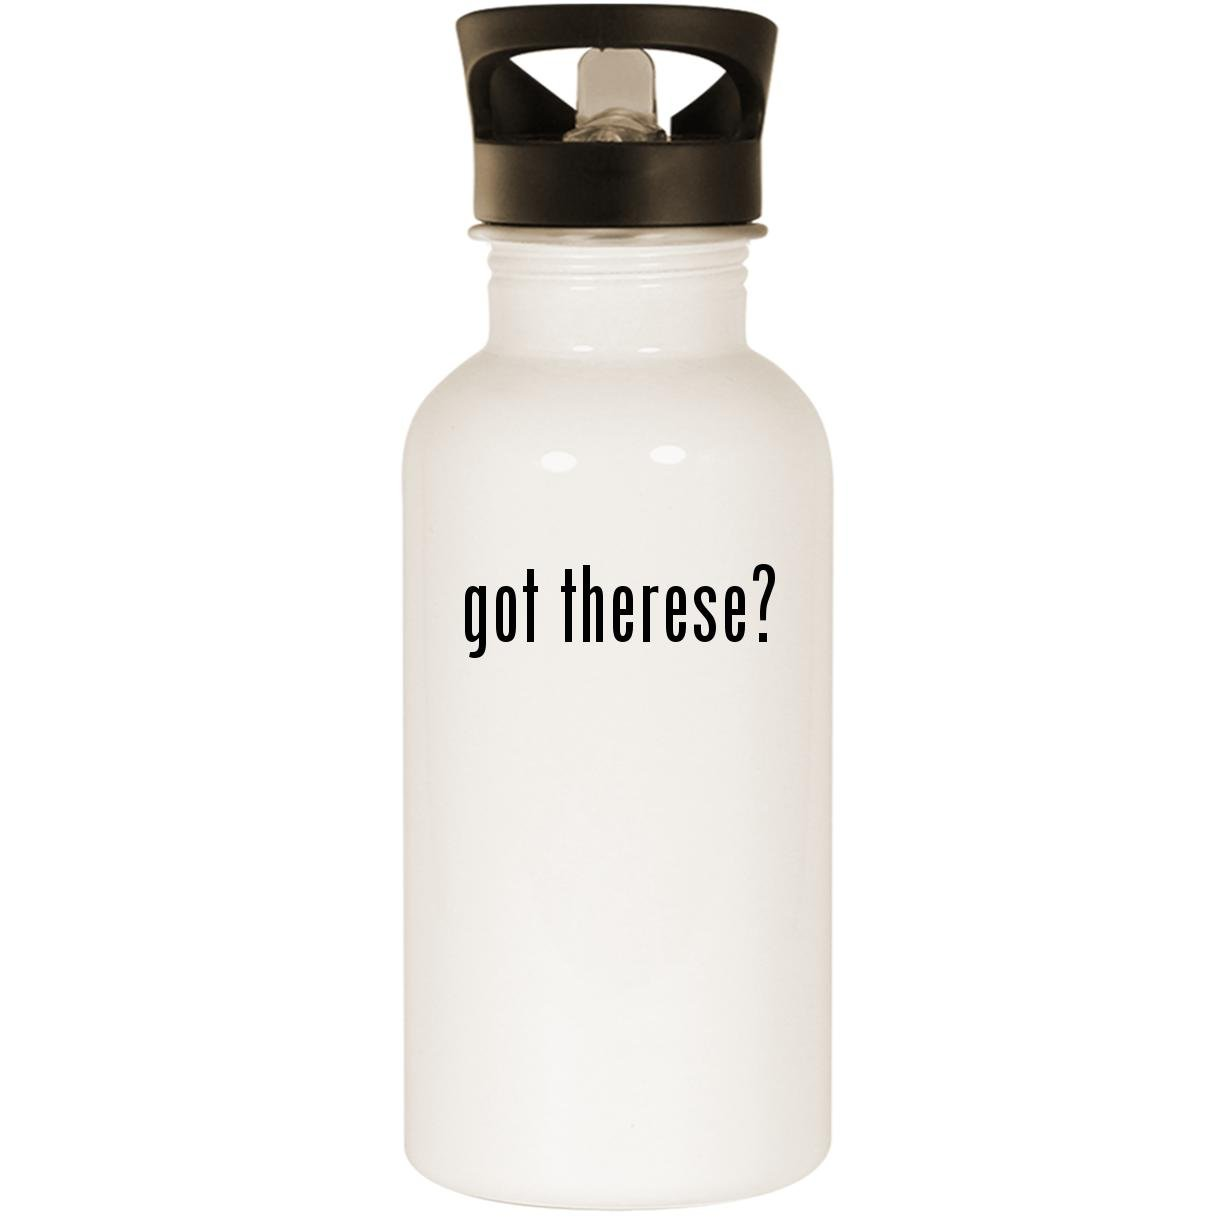 Got Therese  – ステンレススチール20oz Road Ready水ボトル ホワイト US-C-07-18-01-087720-04-26-19-26 B07FM5MN3L  ホワイト